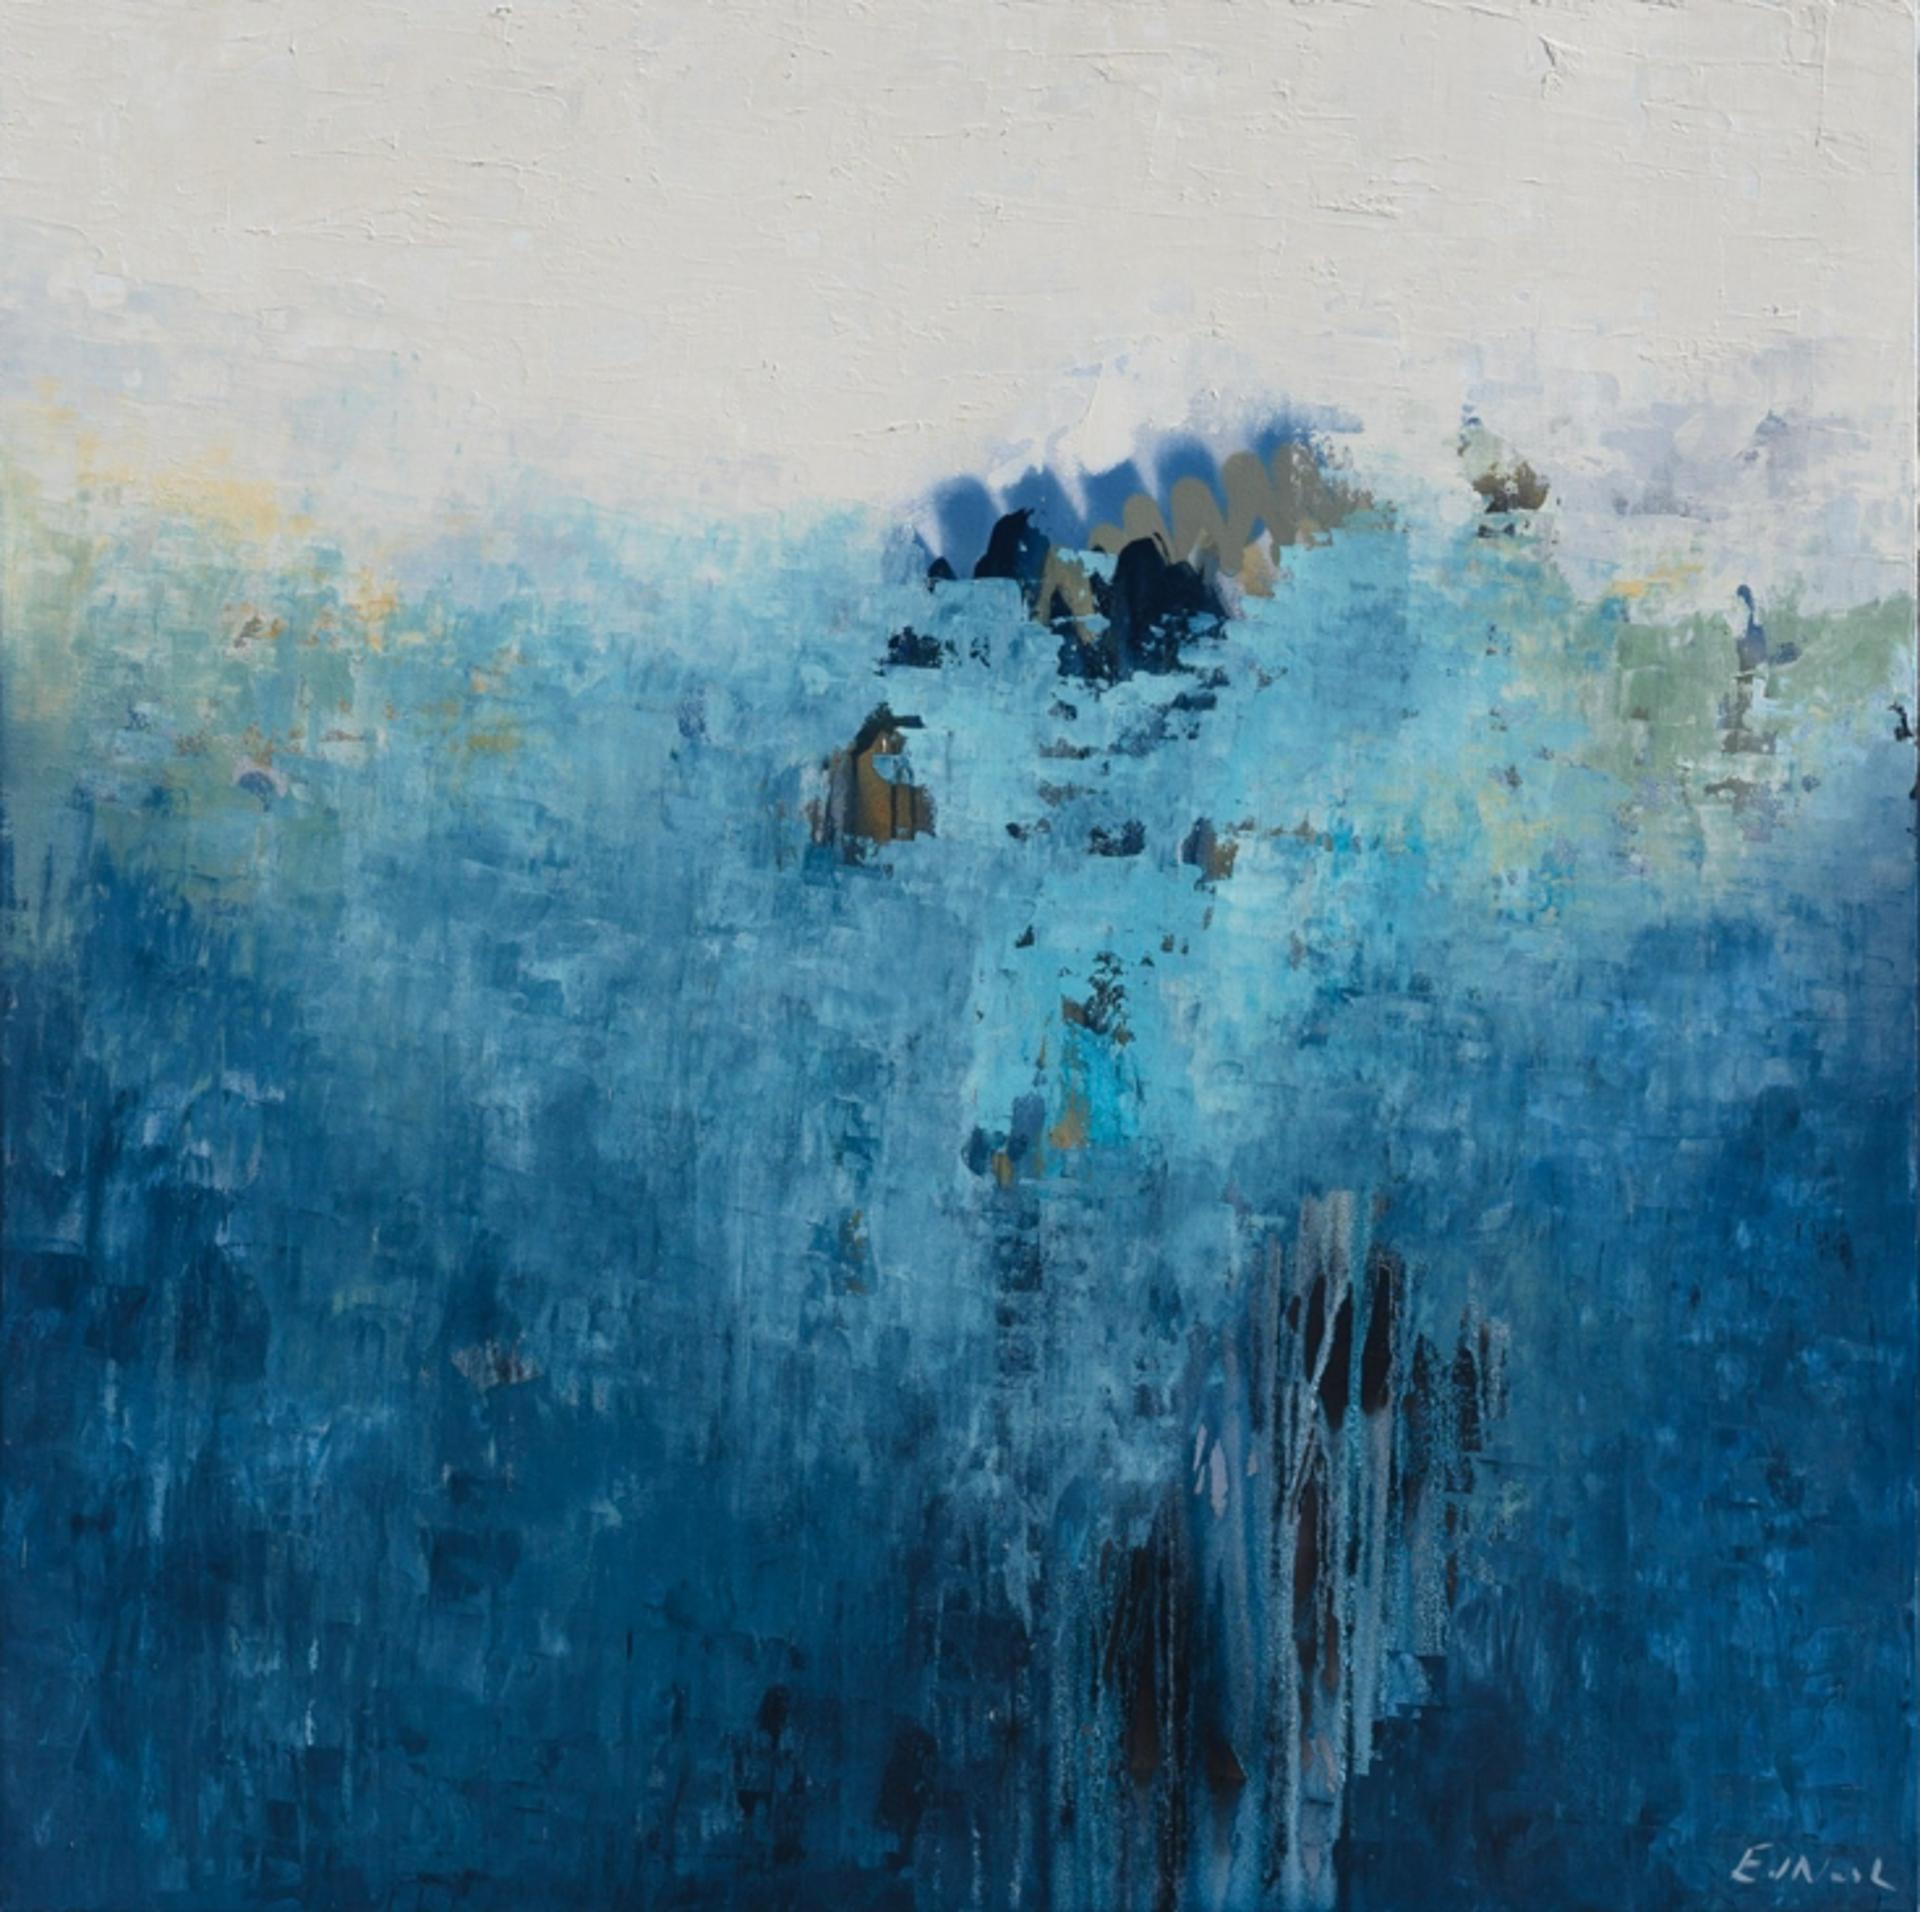 Nautical Depths XV by Ed Nash